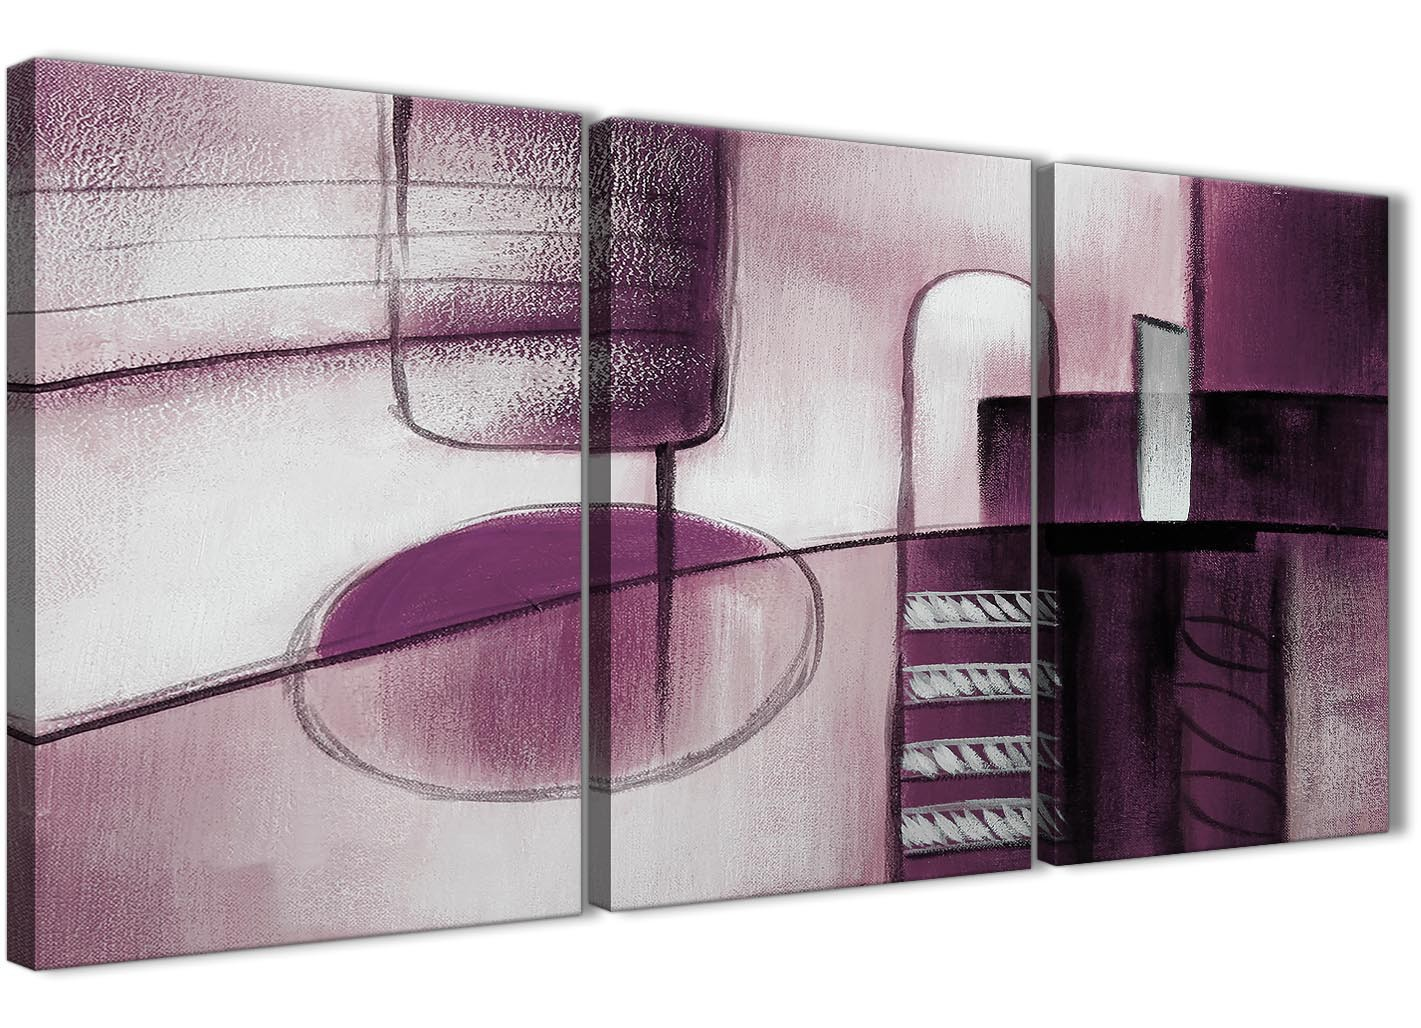 3 Piece Plum Grey Painting Hallway Canvas Pictures Decor